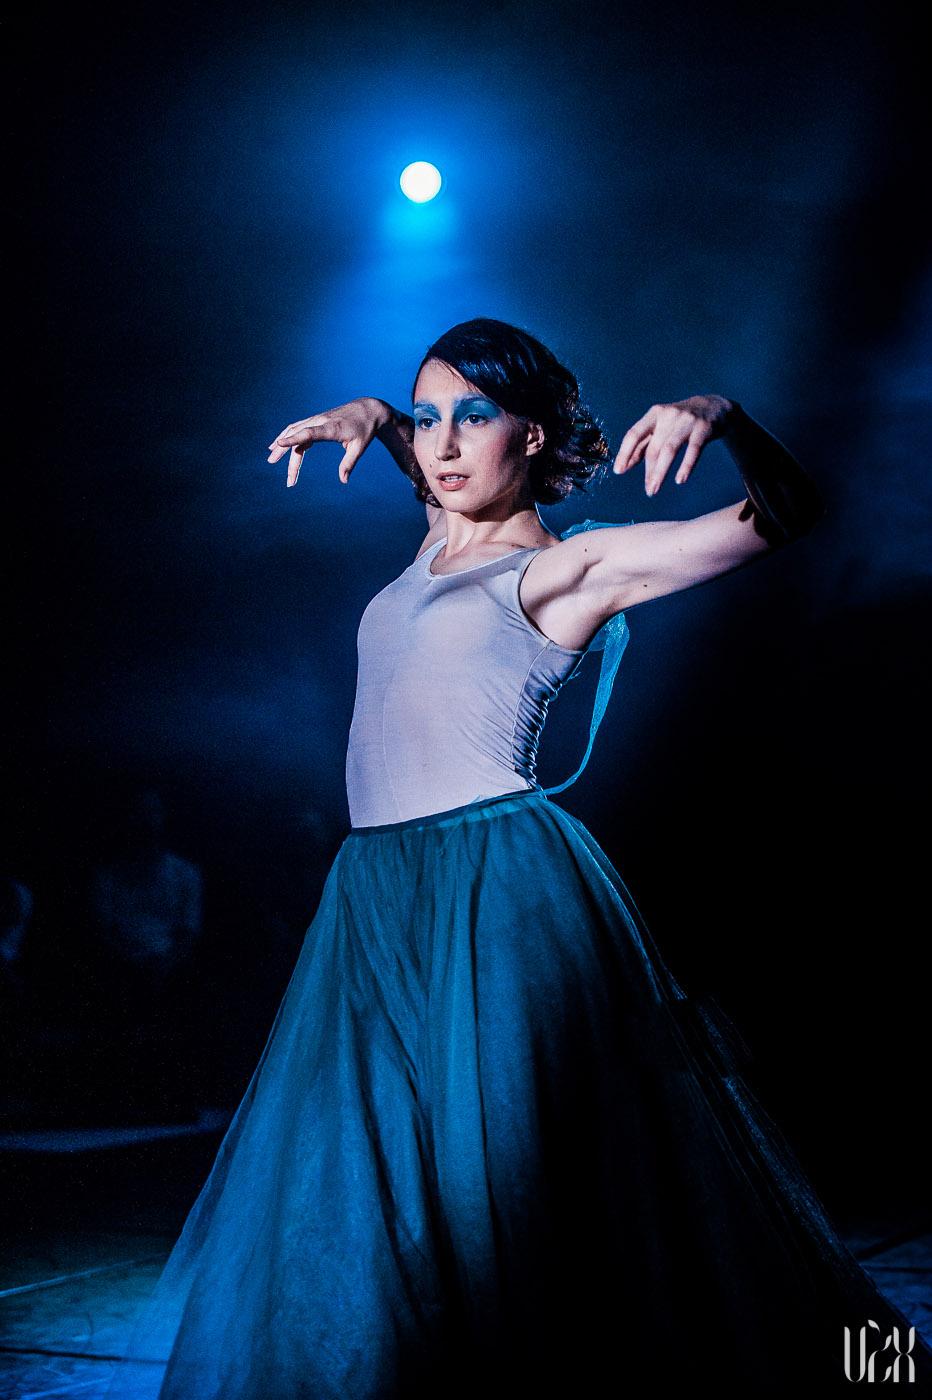 E.sabaliauskaite Vzx.lt Faustas Teatras Event 015